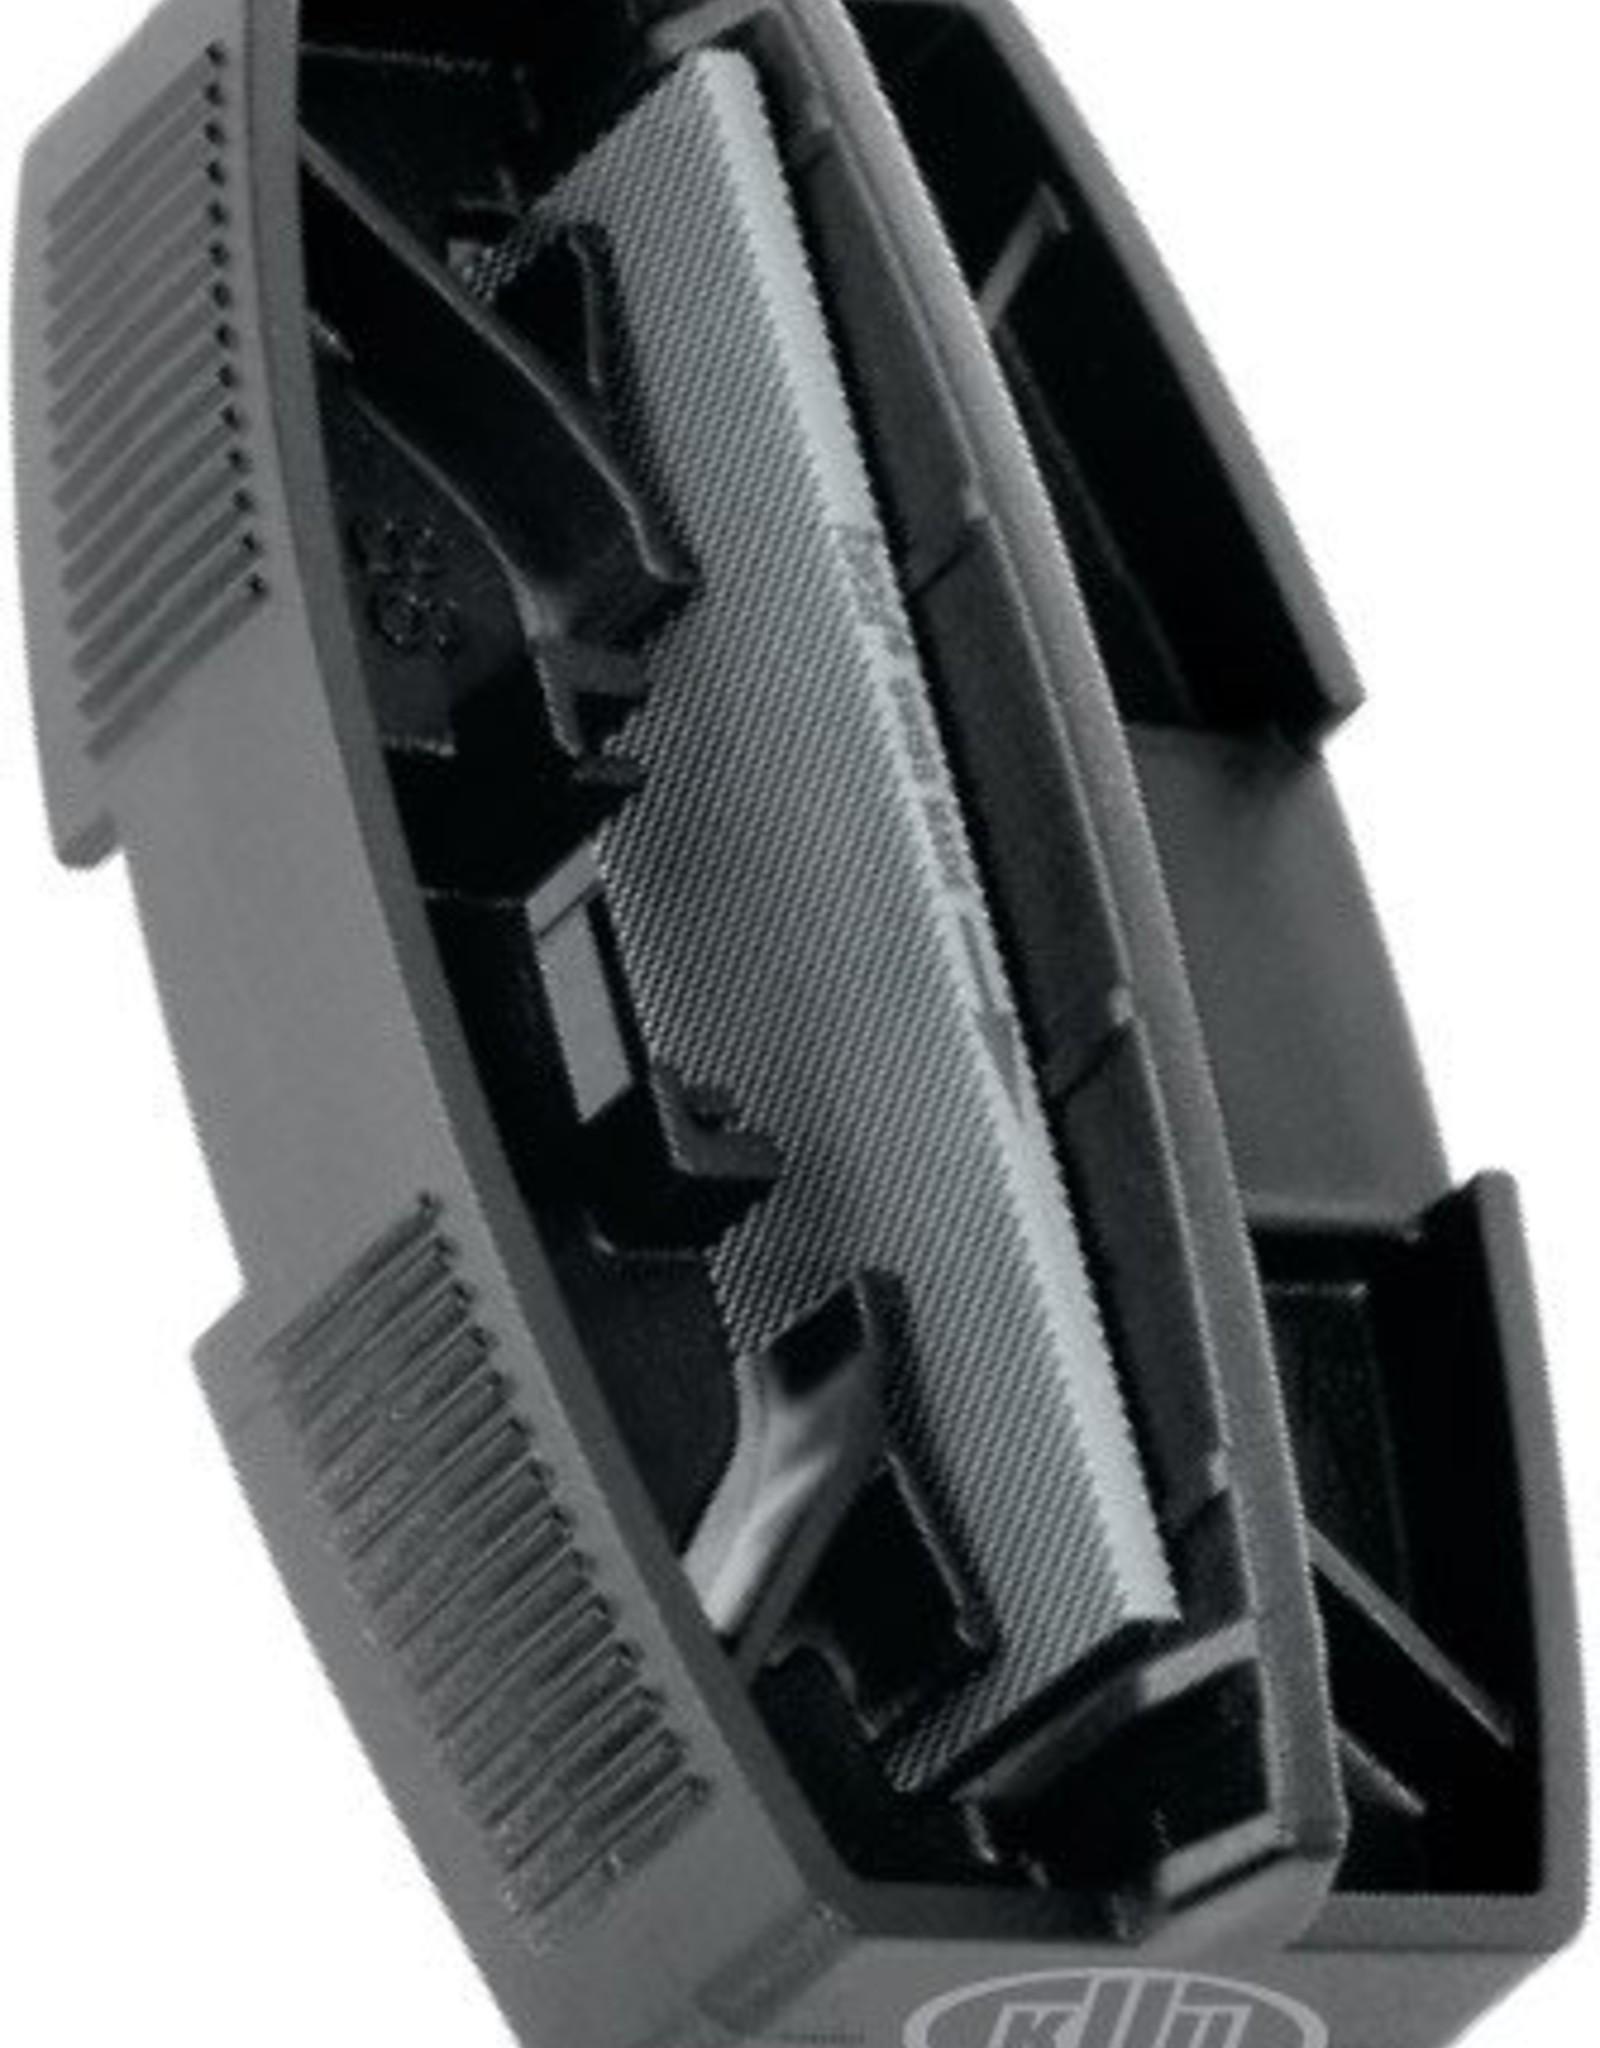 KUU - COMBO SHARP (Base + Side Edge Tool)